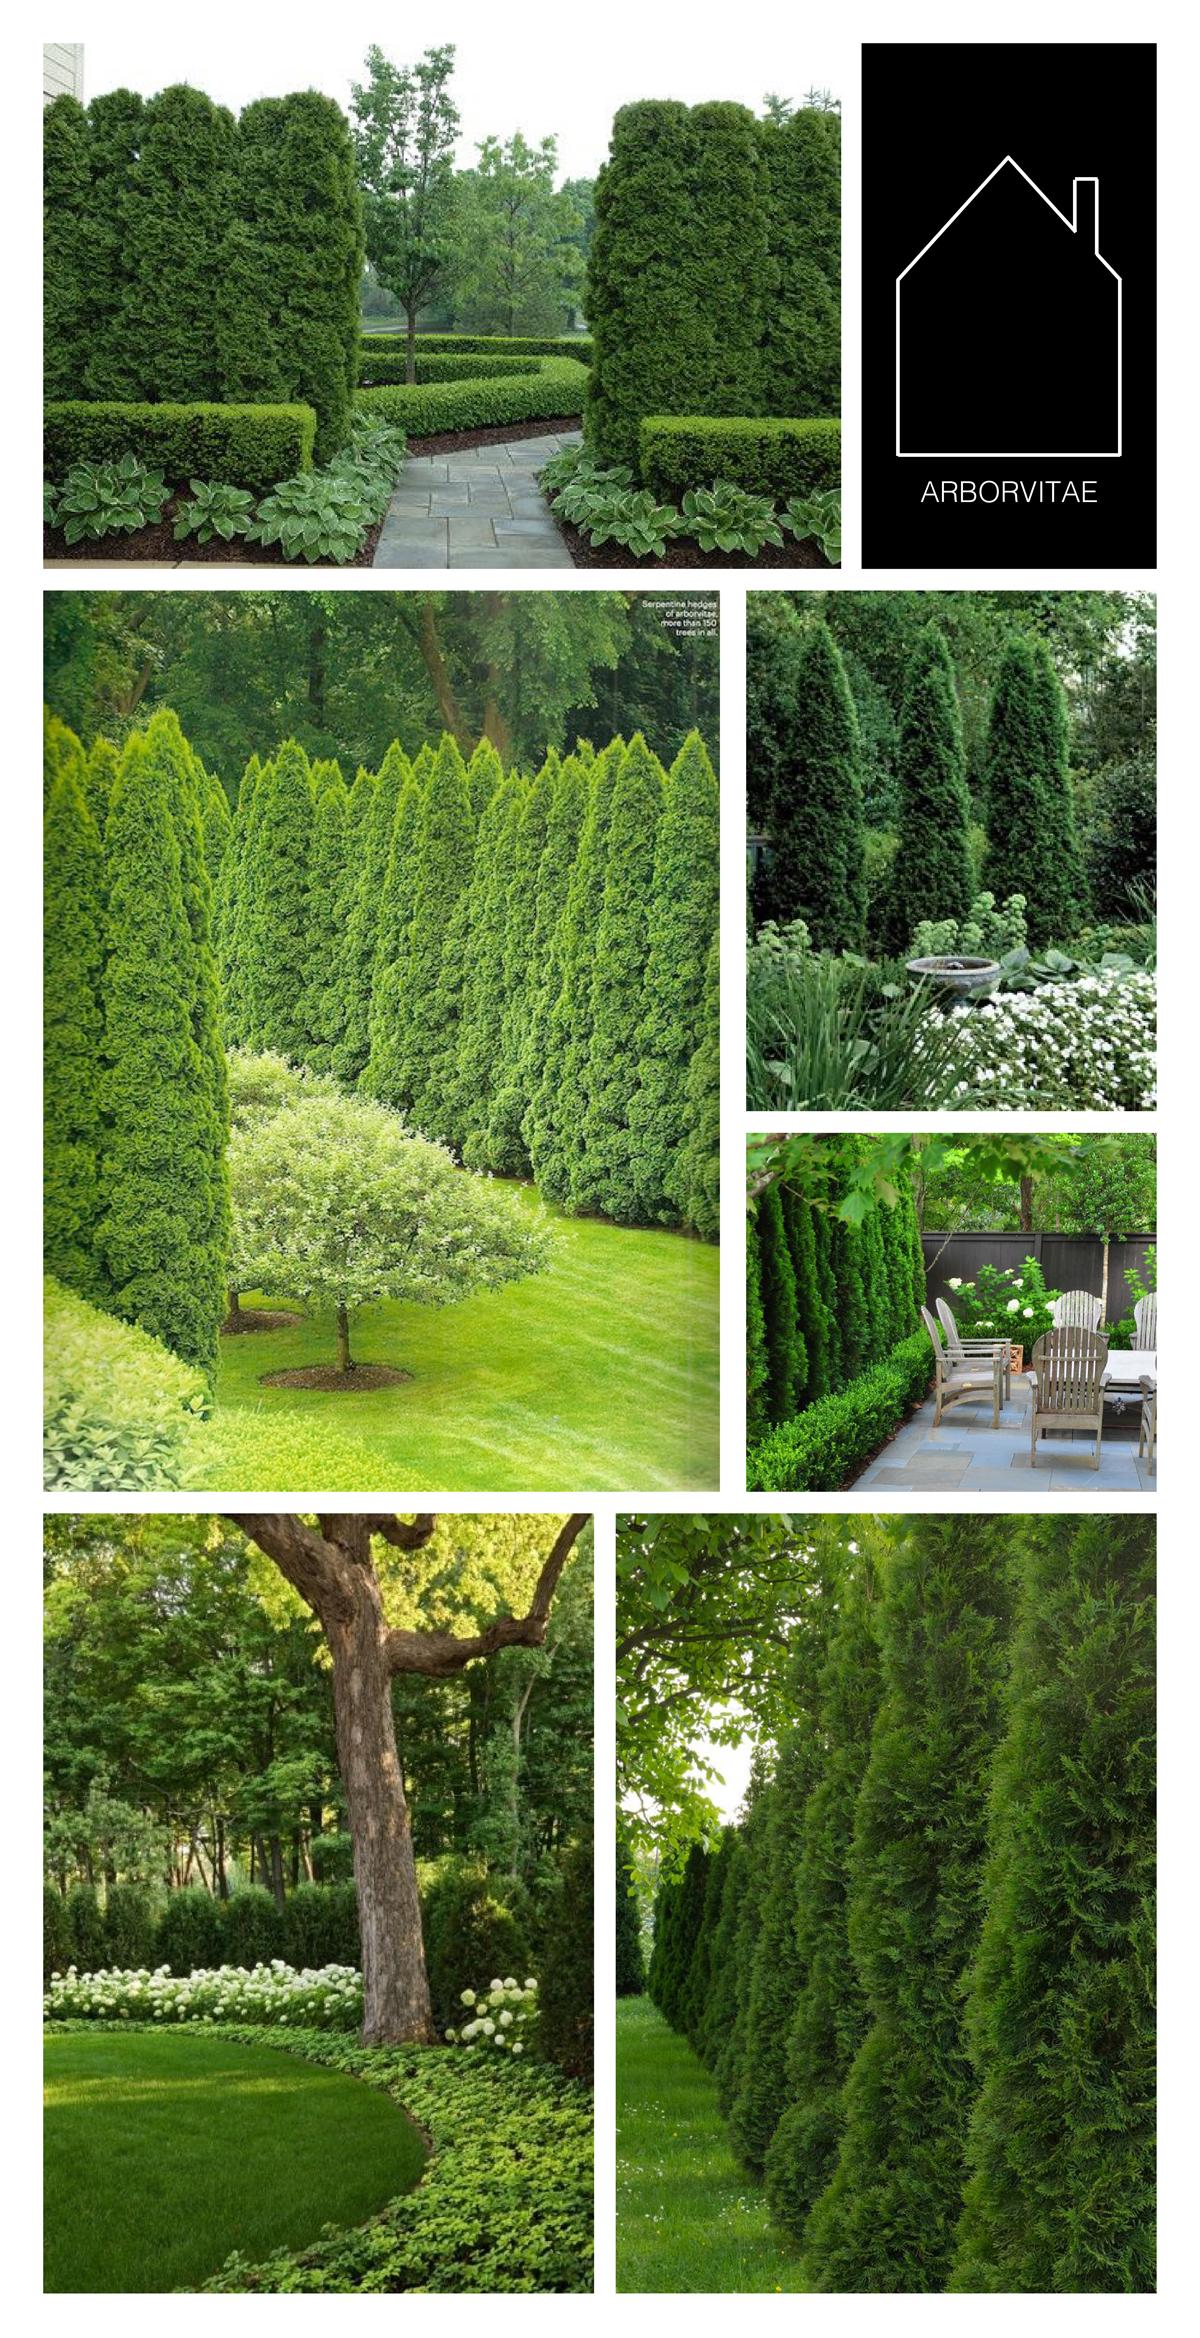 from top left - design by  Land Architects  via  Houzz  - via  Quintessence  - design by Zachary Duff via  Atlanta Homes & Lifestyles - design by  Falkner Gardens  - via  Bungalow Blue Interiors  - via  The Tree Center  | THE PLACE HOME